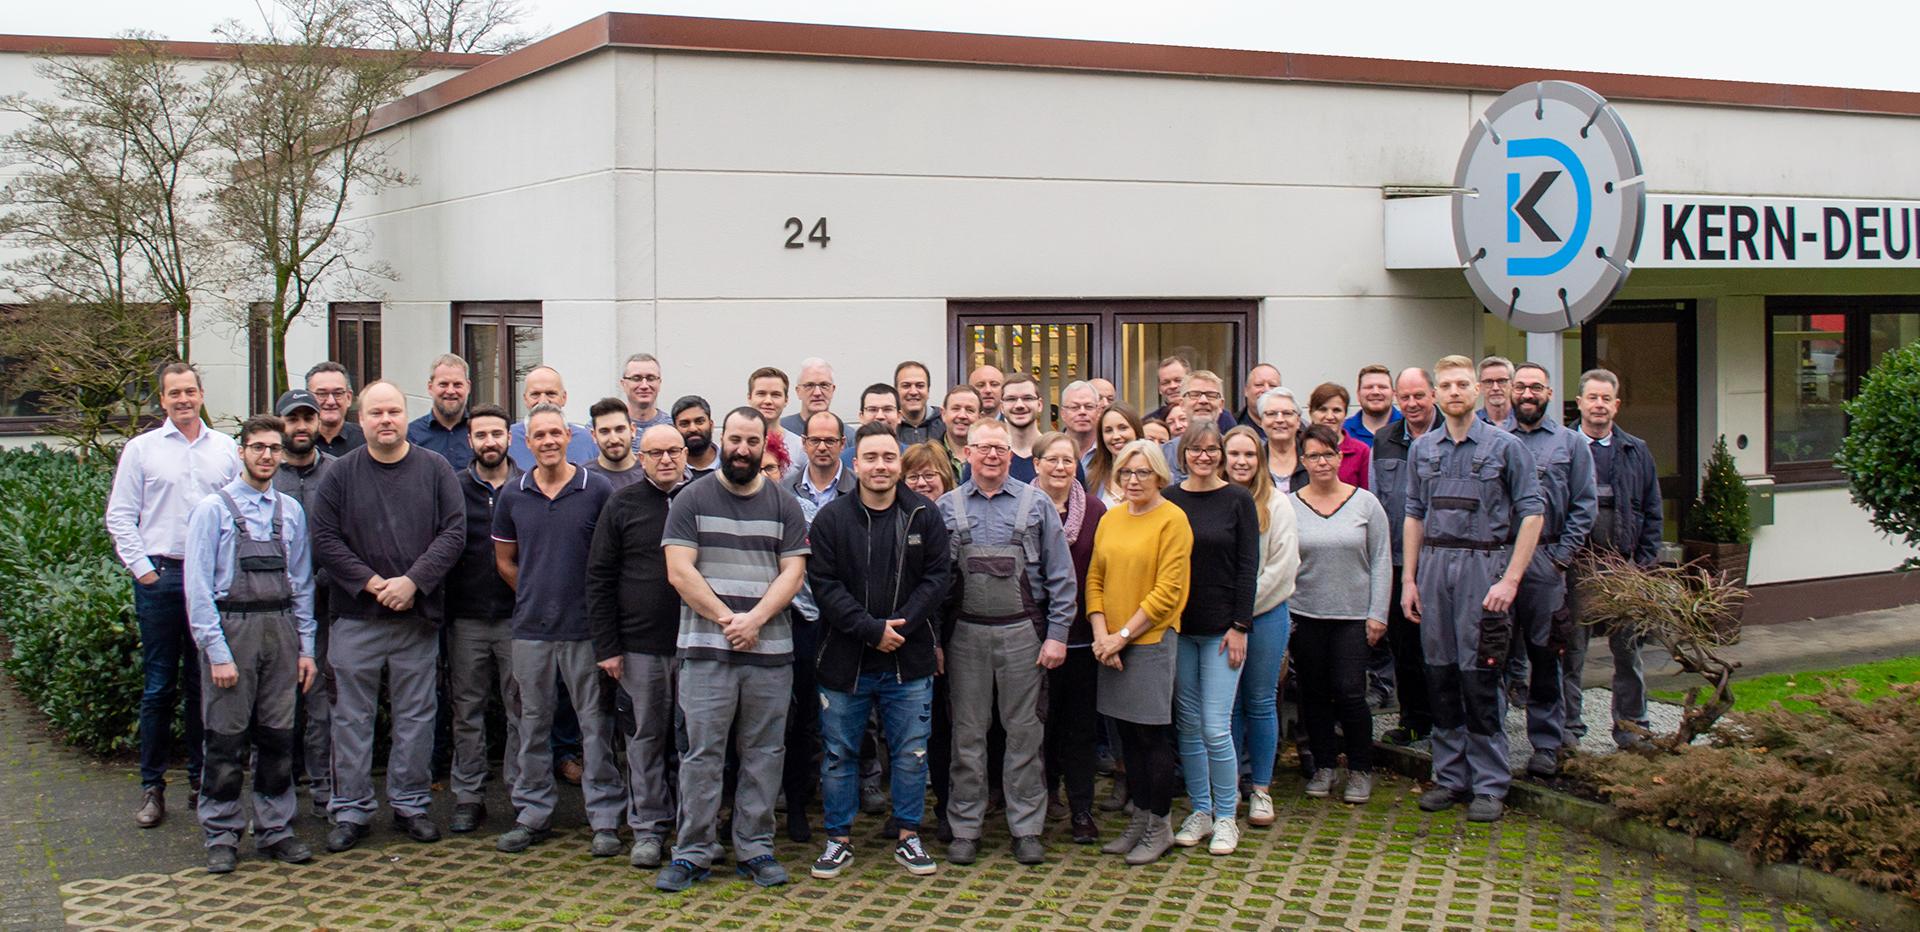 KERN-DEUDIAM in Hövelhof: werden Sie Teil unseres Teams!